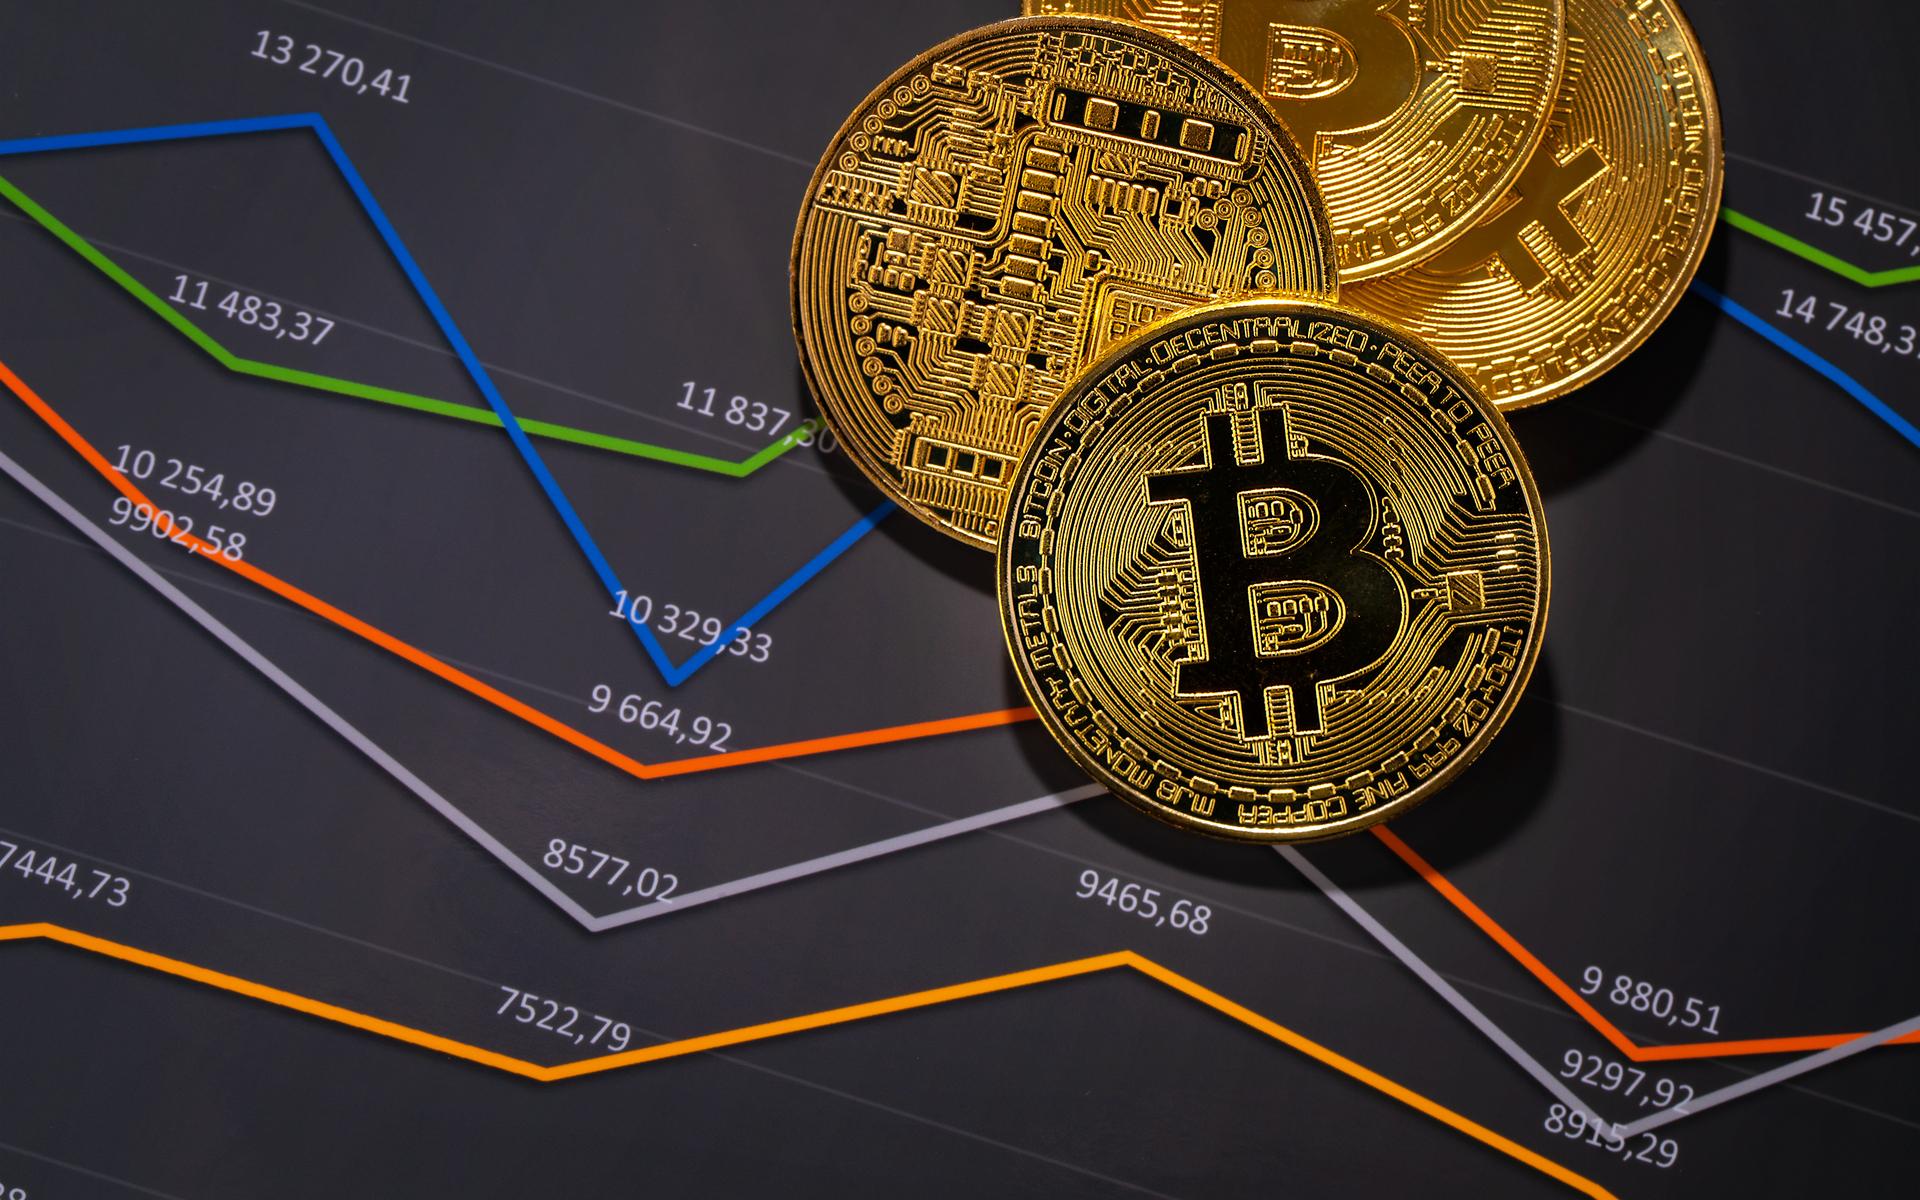 Bitcoin price shows correlation to global economic crisis